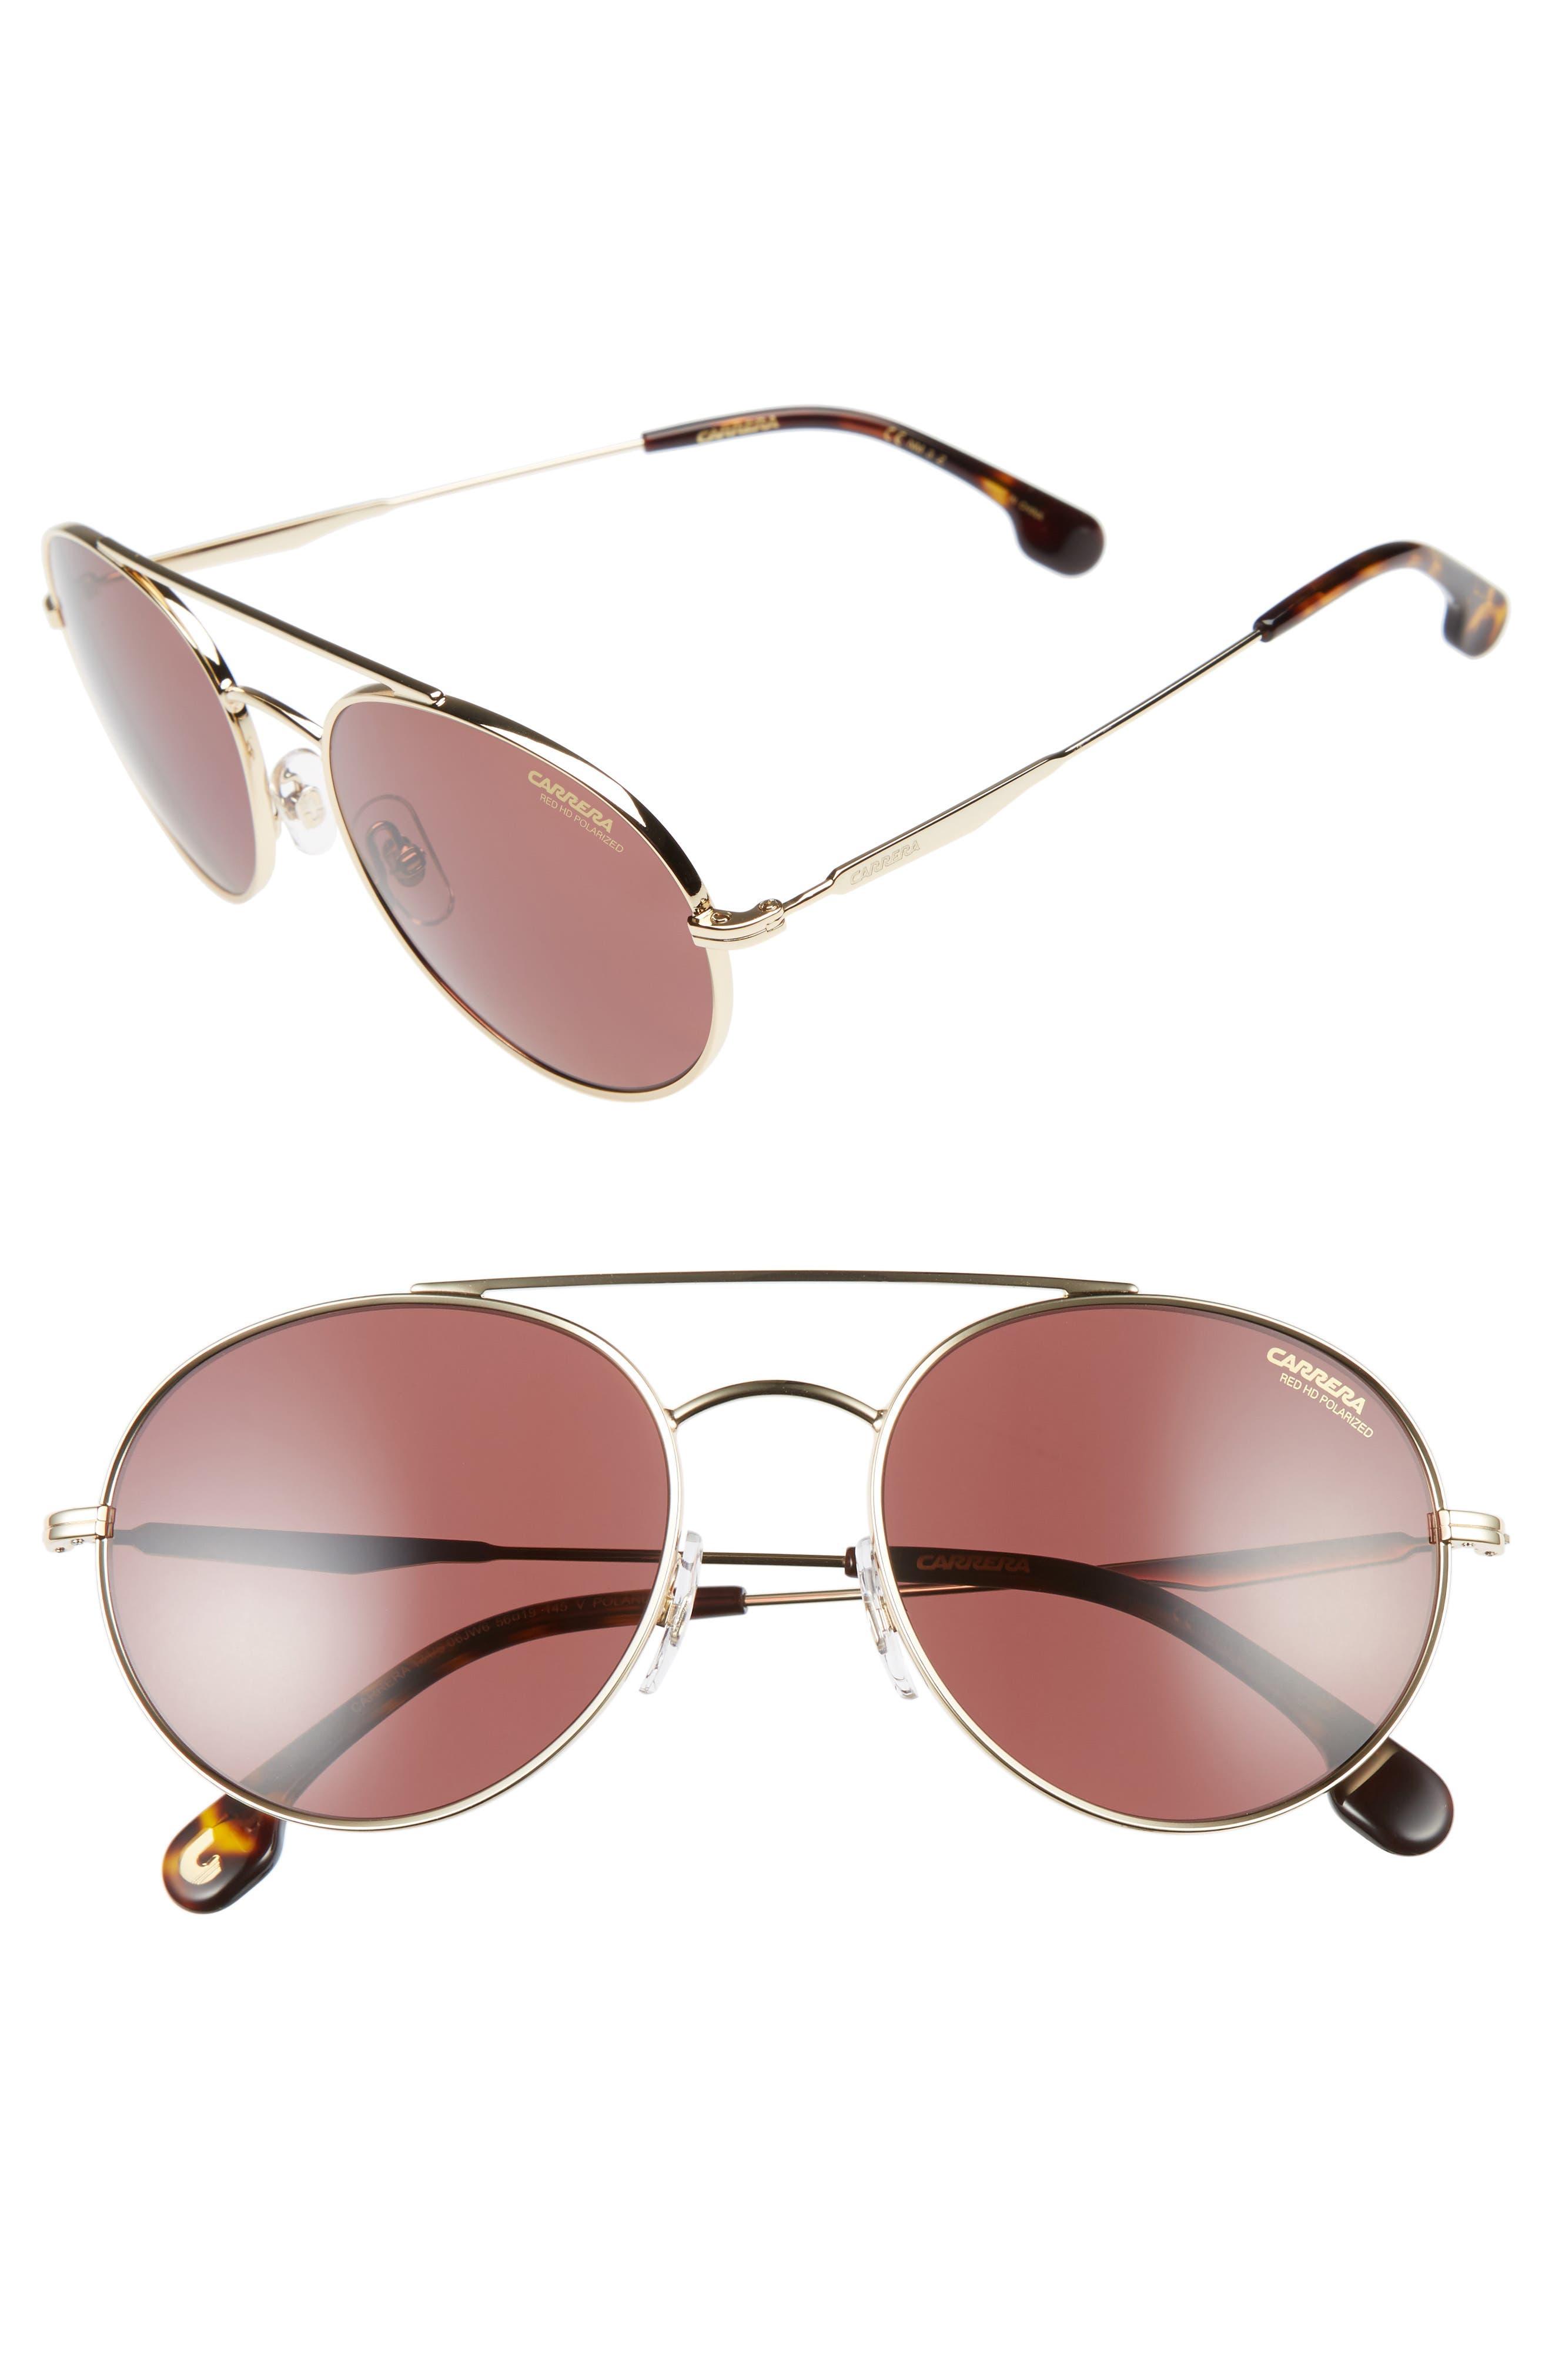 CARRERA EYEWEAR 59mm Polarized Sunglasses